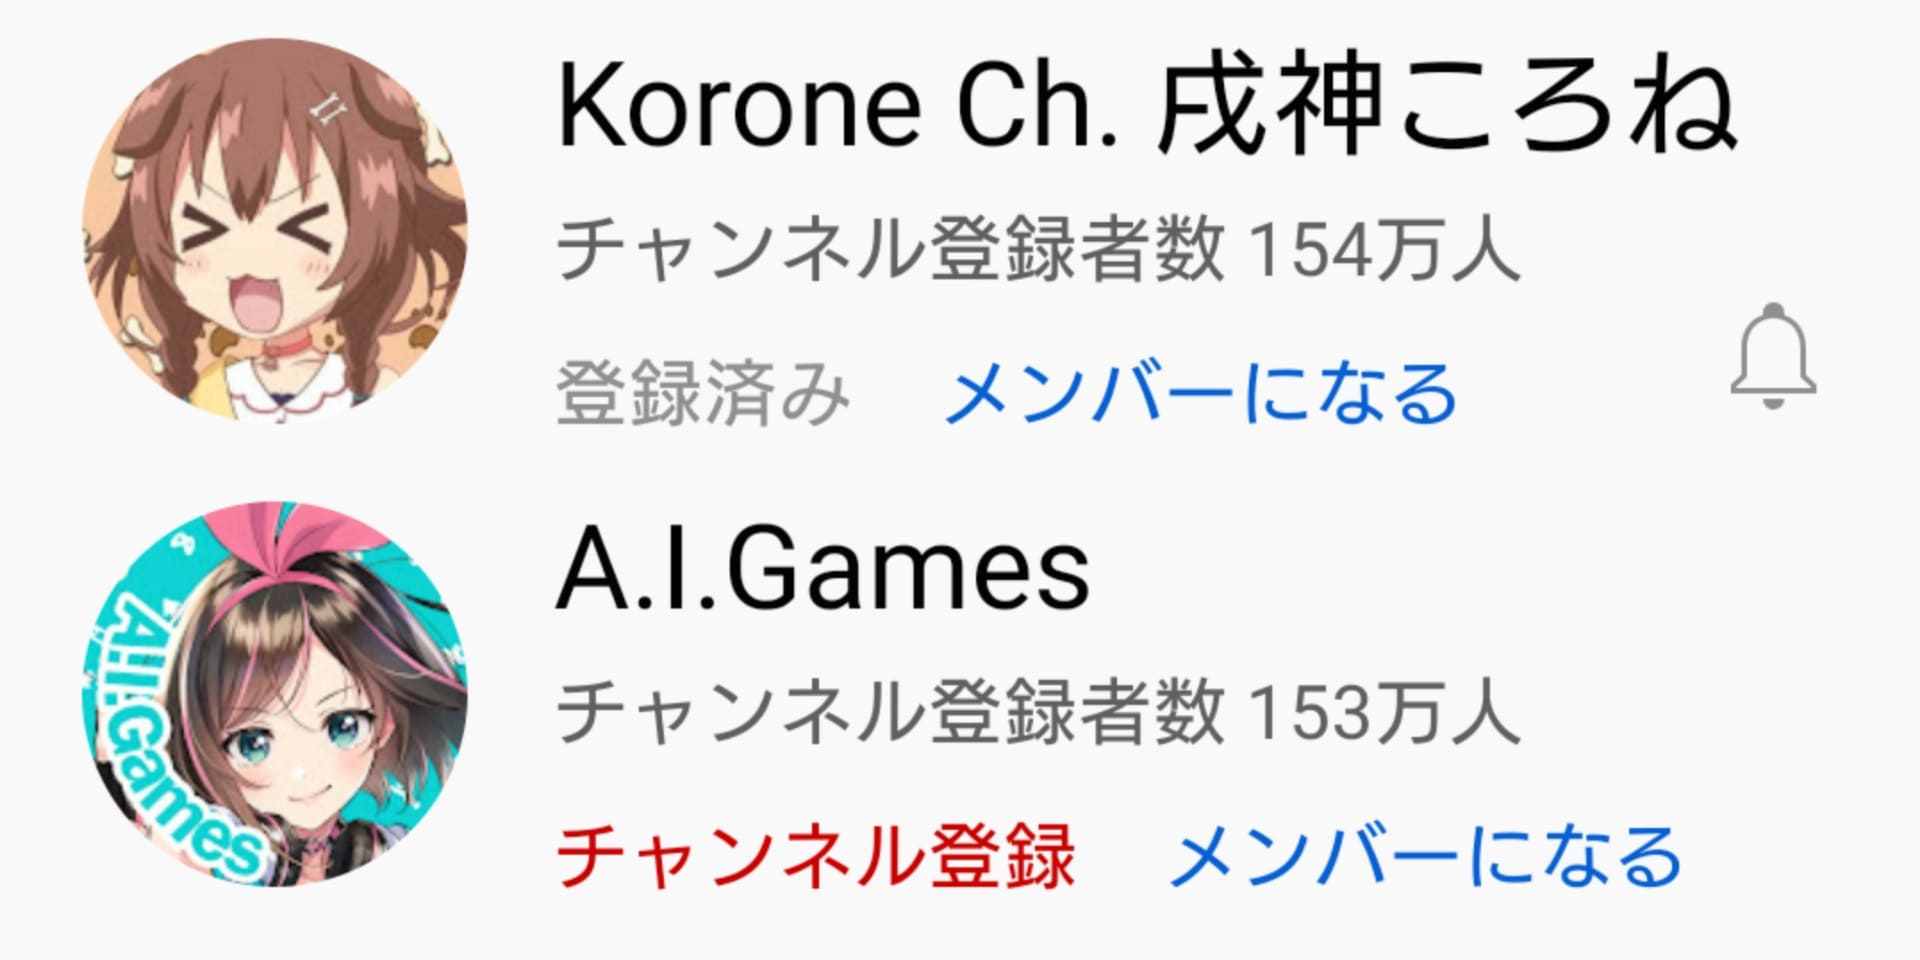 VTuber 戌神ころね キズナアイ「A.I.Games」上回るYouTubeチャンネル登録者数を記録